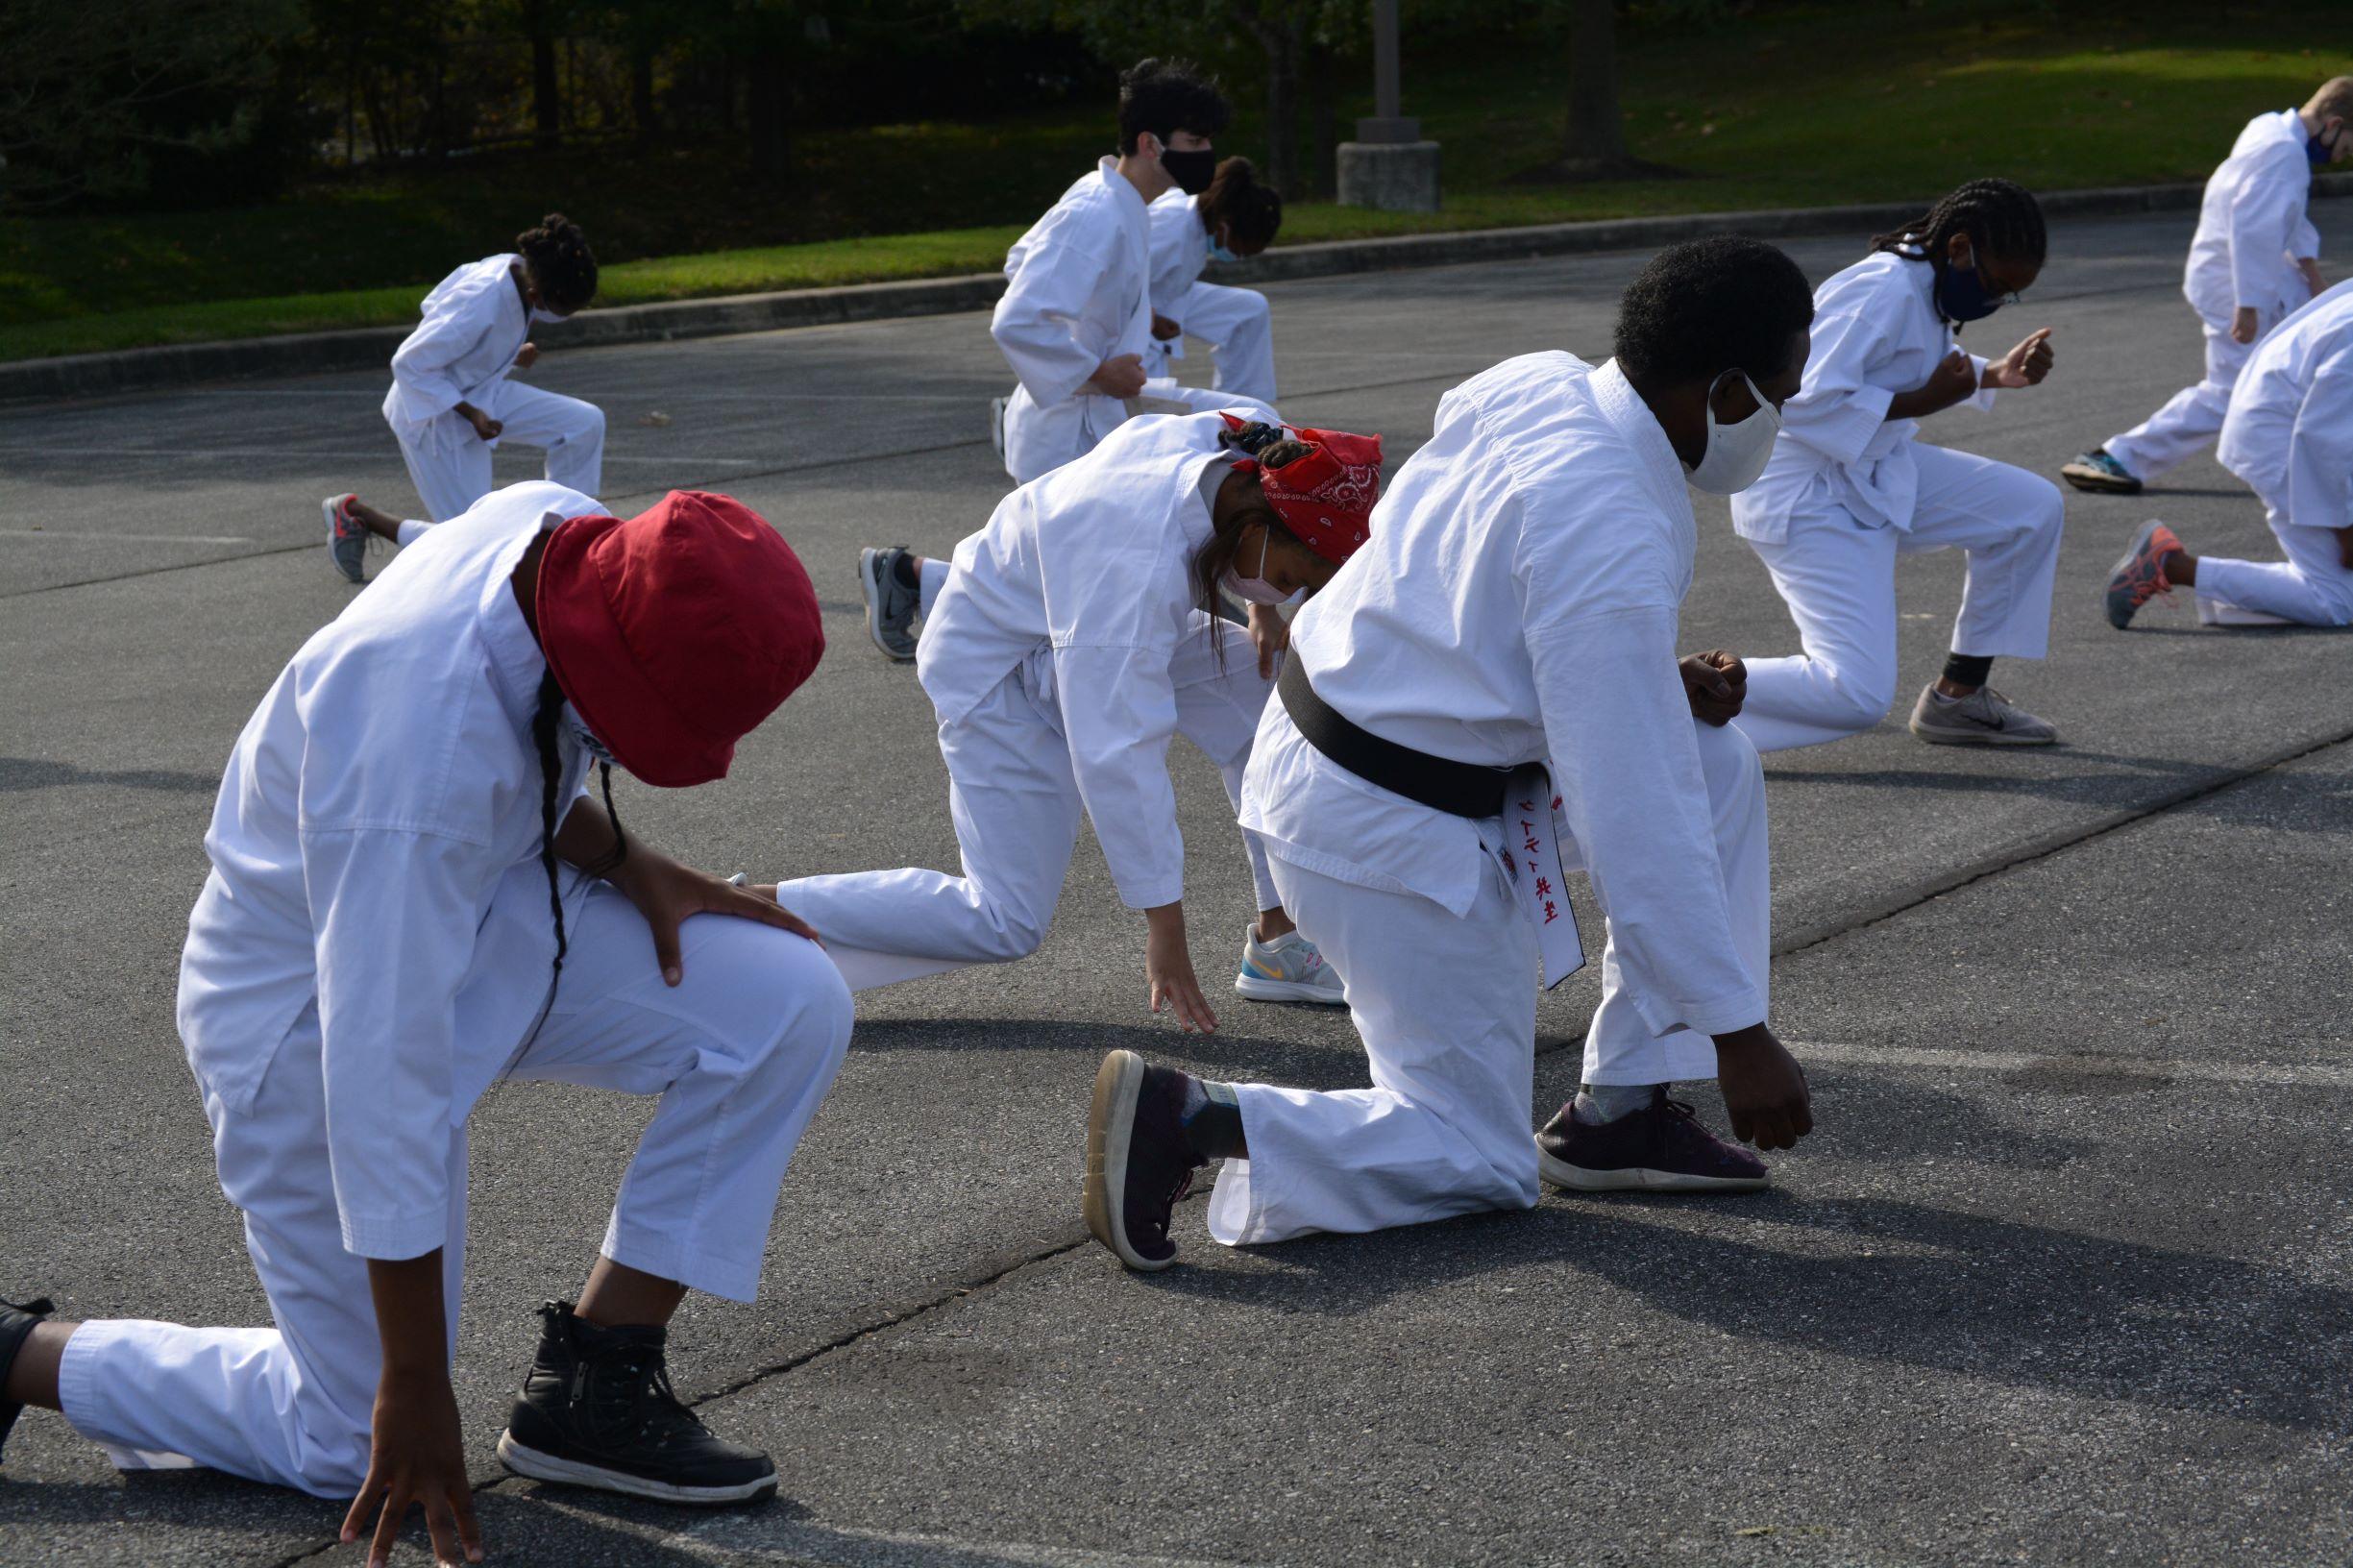 Karate - sizing stance